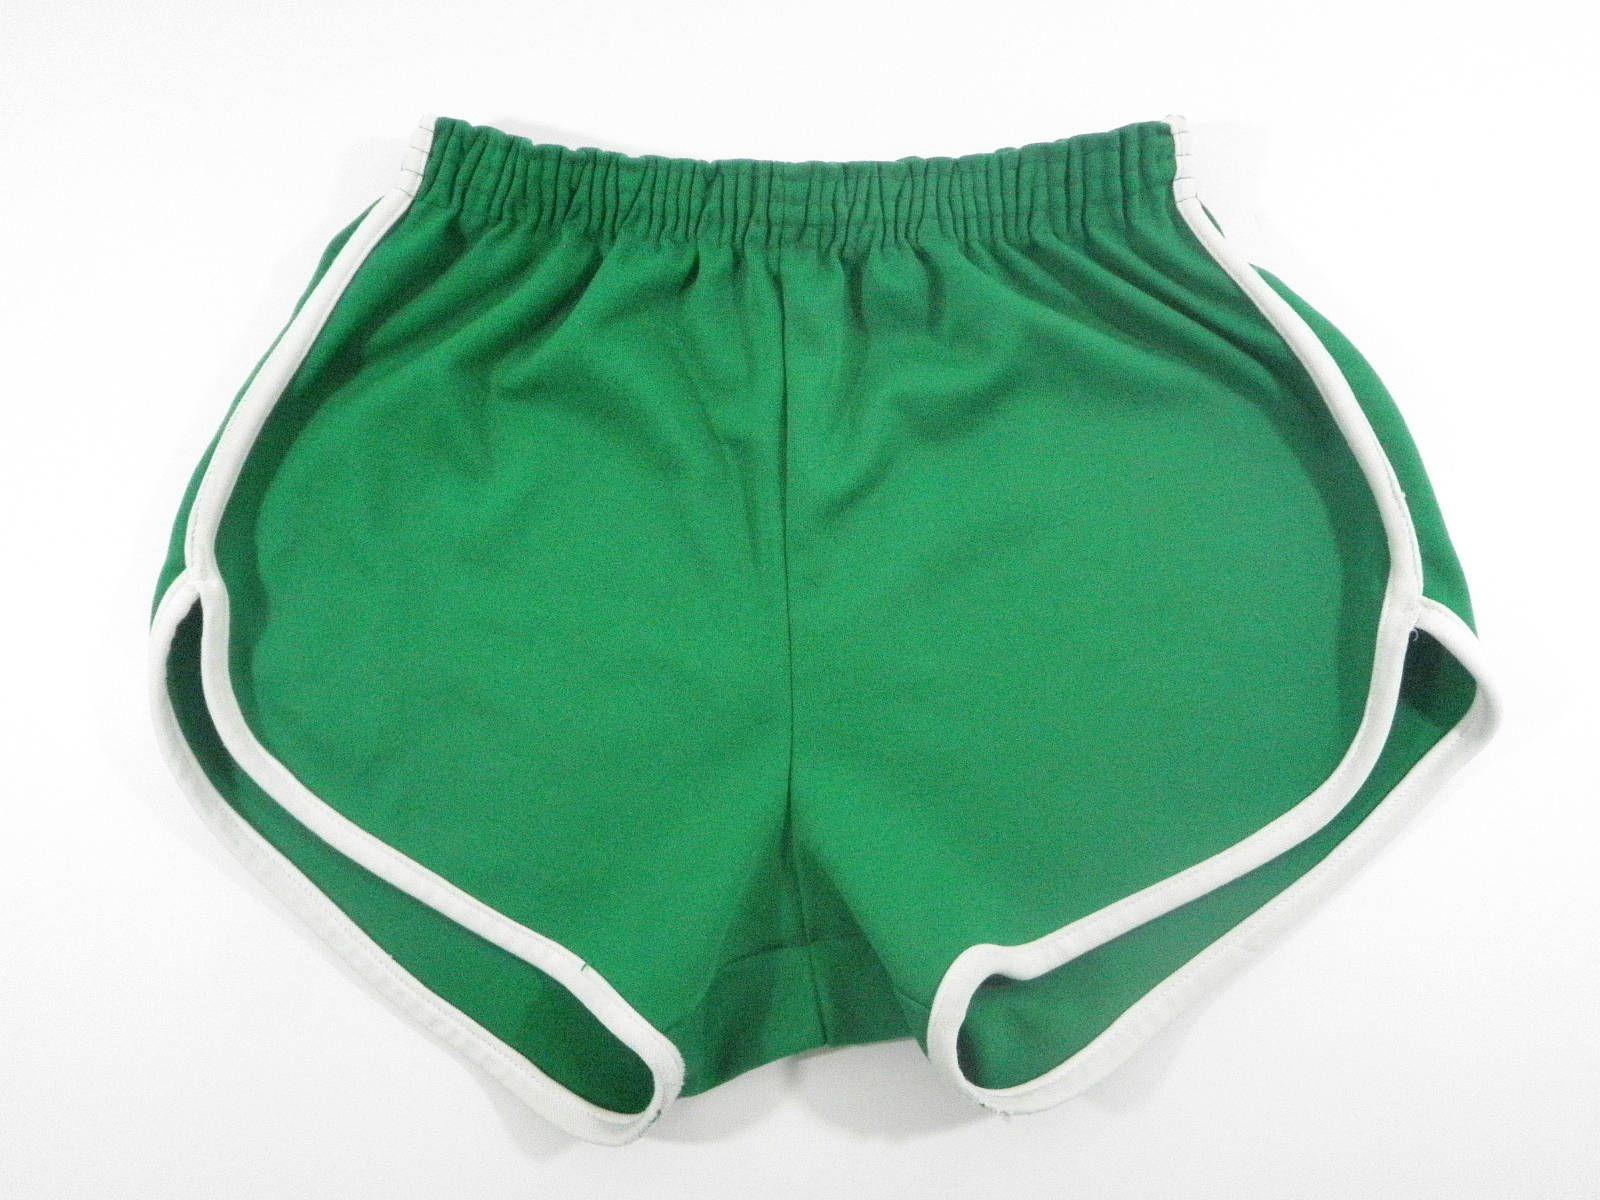 039884dcef Vintage Soffe Green White Piping Polyester Gym Shorts Adult Large Coach  Athletic by TraSheeWomen on Etsy #vintage #mensshorts #coachshorts  #shortshorts ...